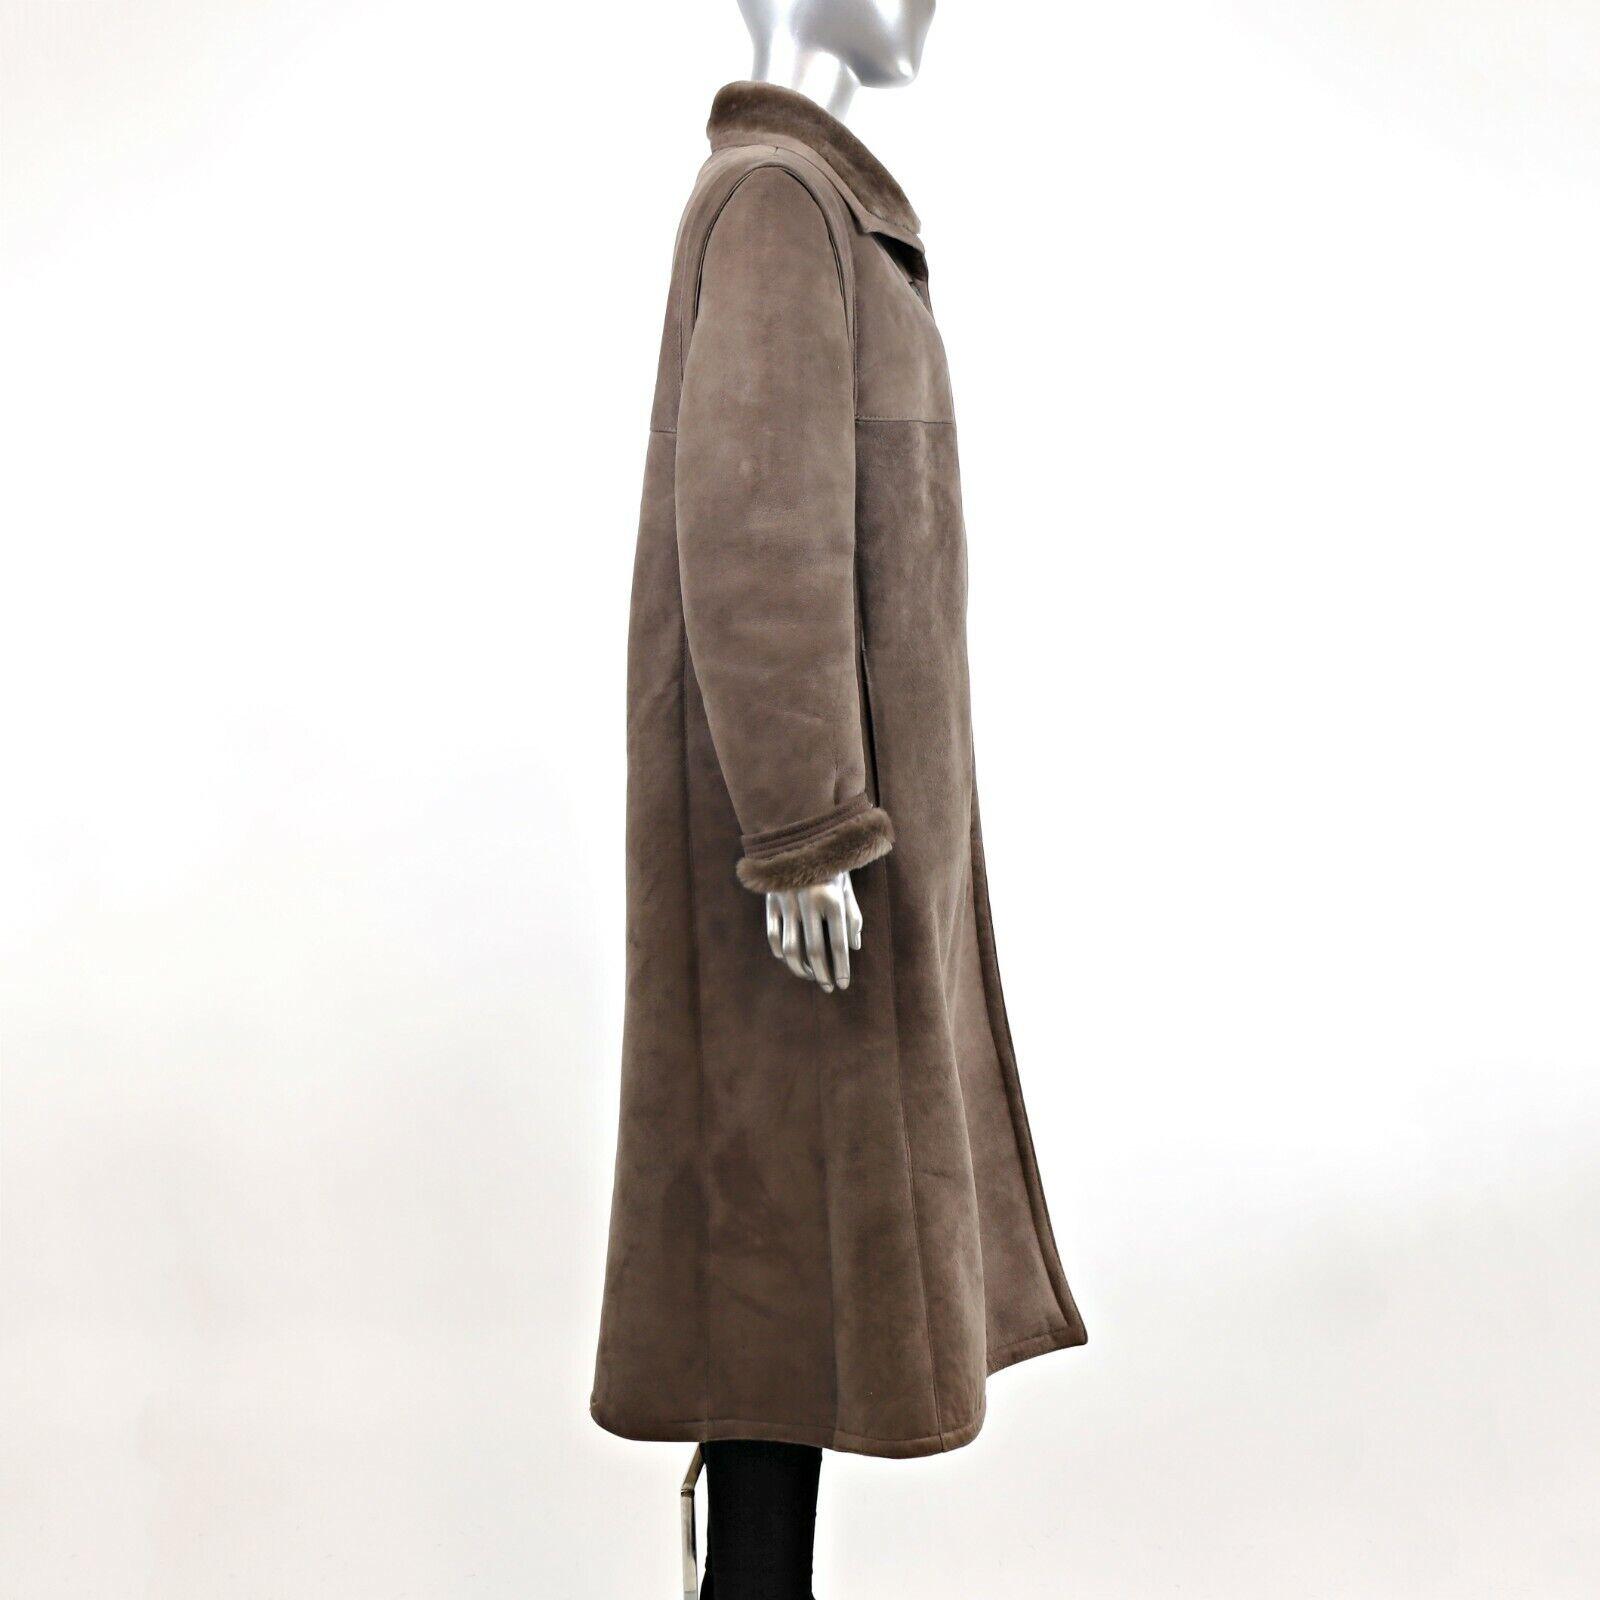 Full Length Shearling Coat- Size M-L (Vintage Fur… - image 5